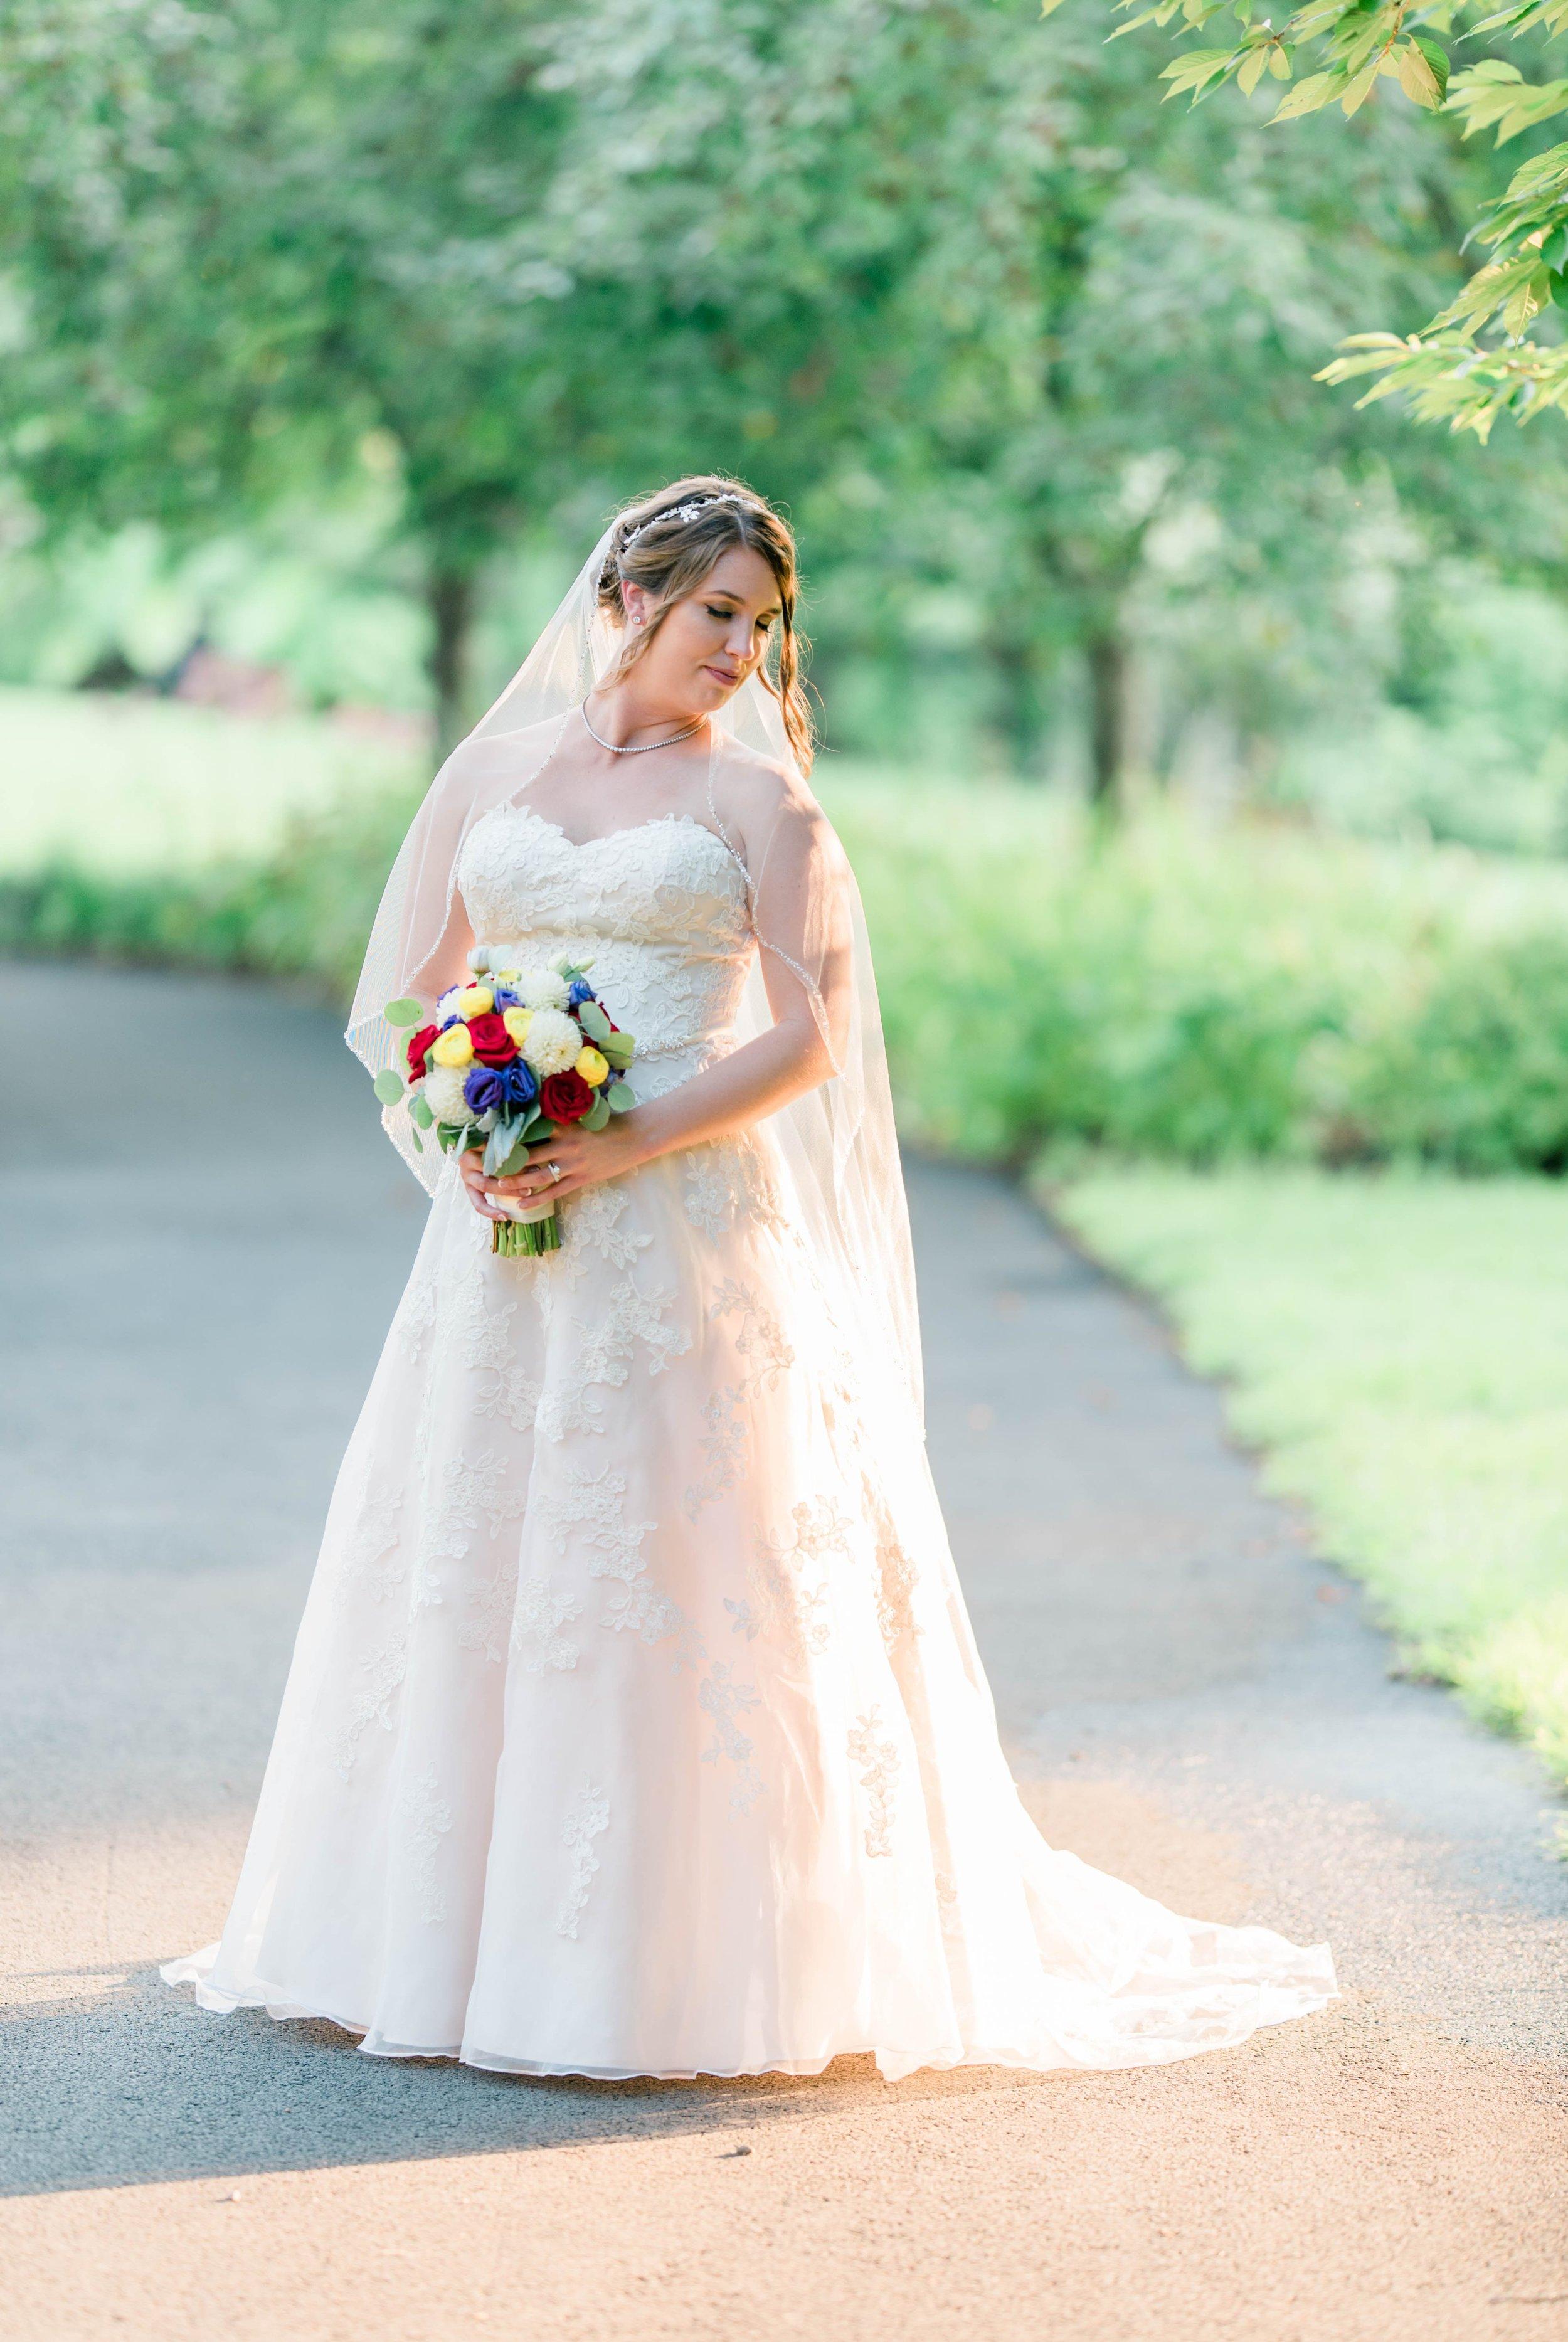 TheAtriumatMeadowlark_Virginiawedding photographer_lynchburgweddingphotographer_DCweddingPhotographer_KristinAaron 33.jpg